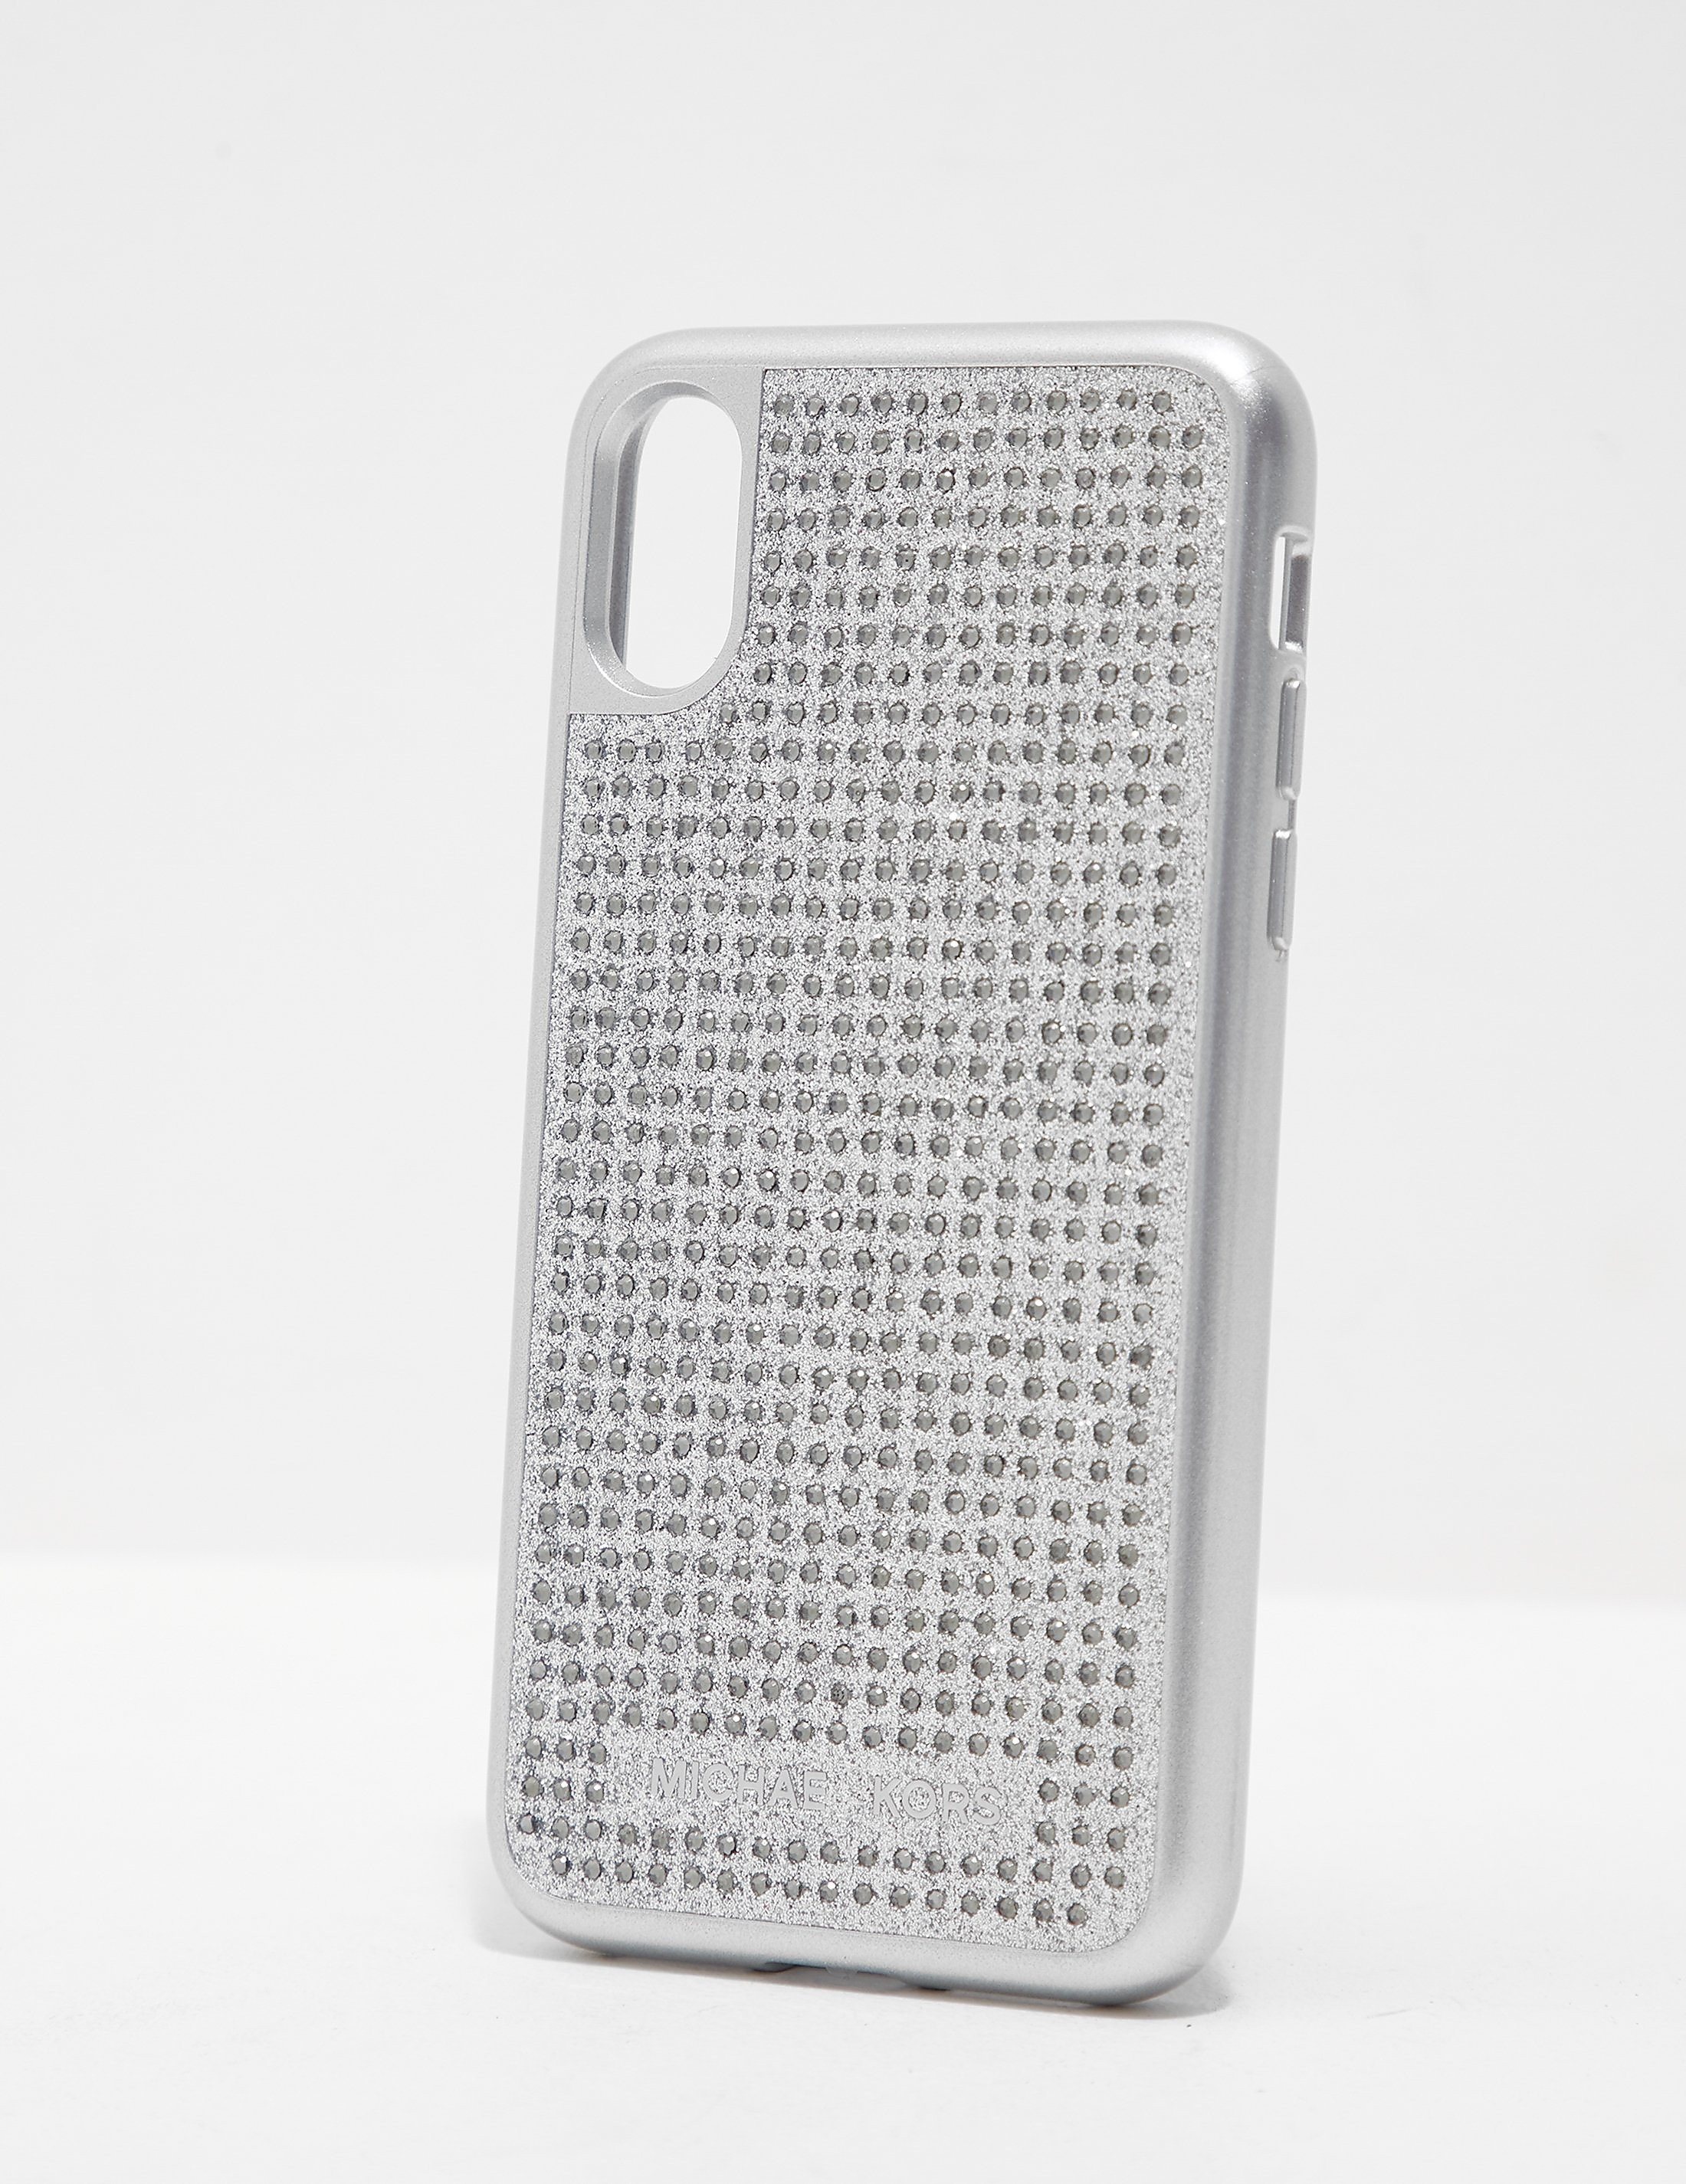 Michael Kors iPhone 8 Phone Cover - Online Exclusive